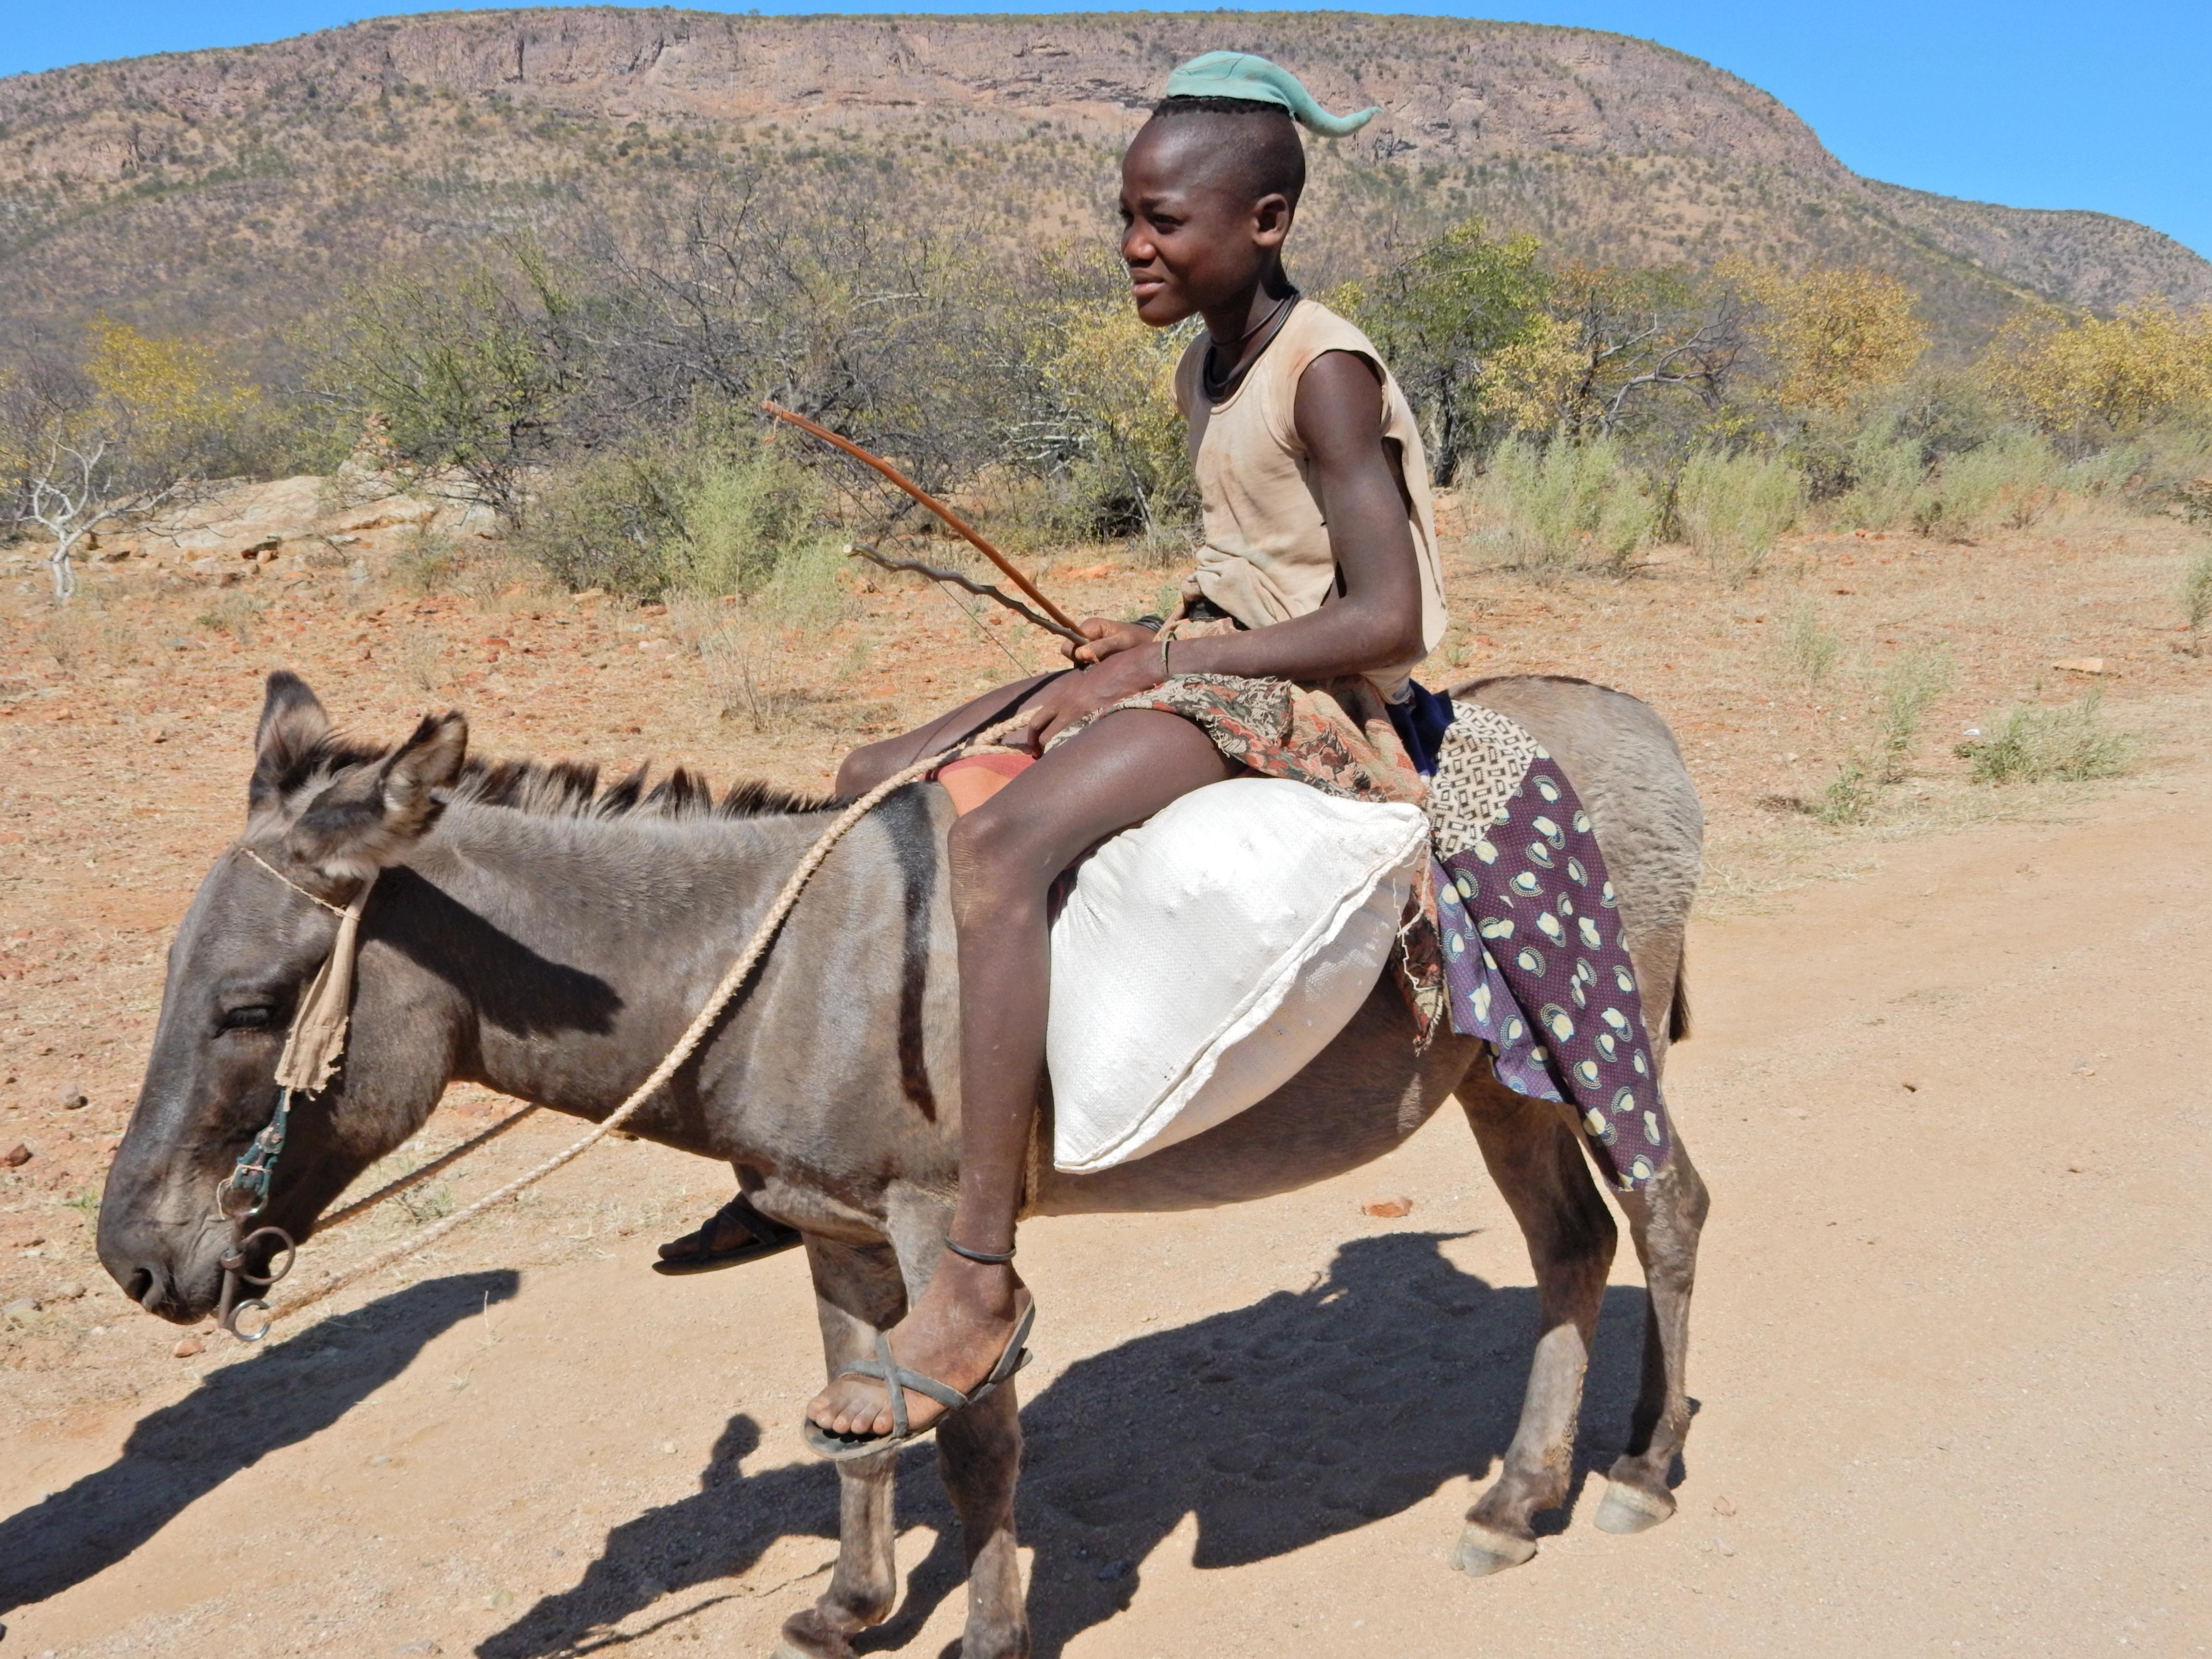 DSCN1178 Visite dun village Himba